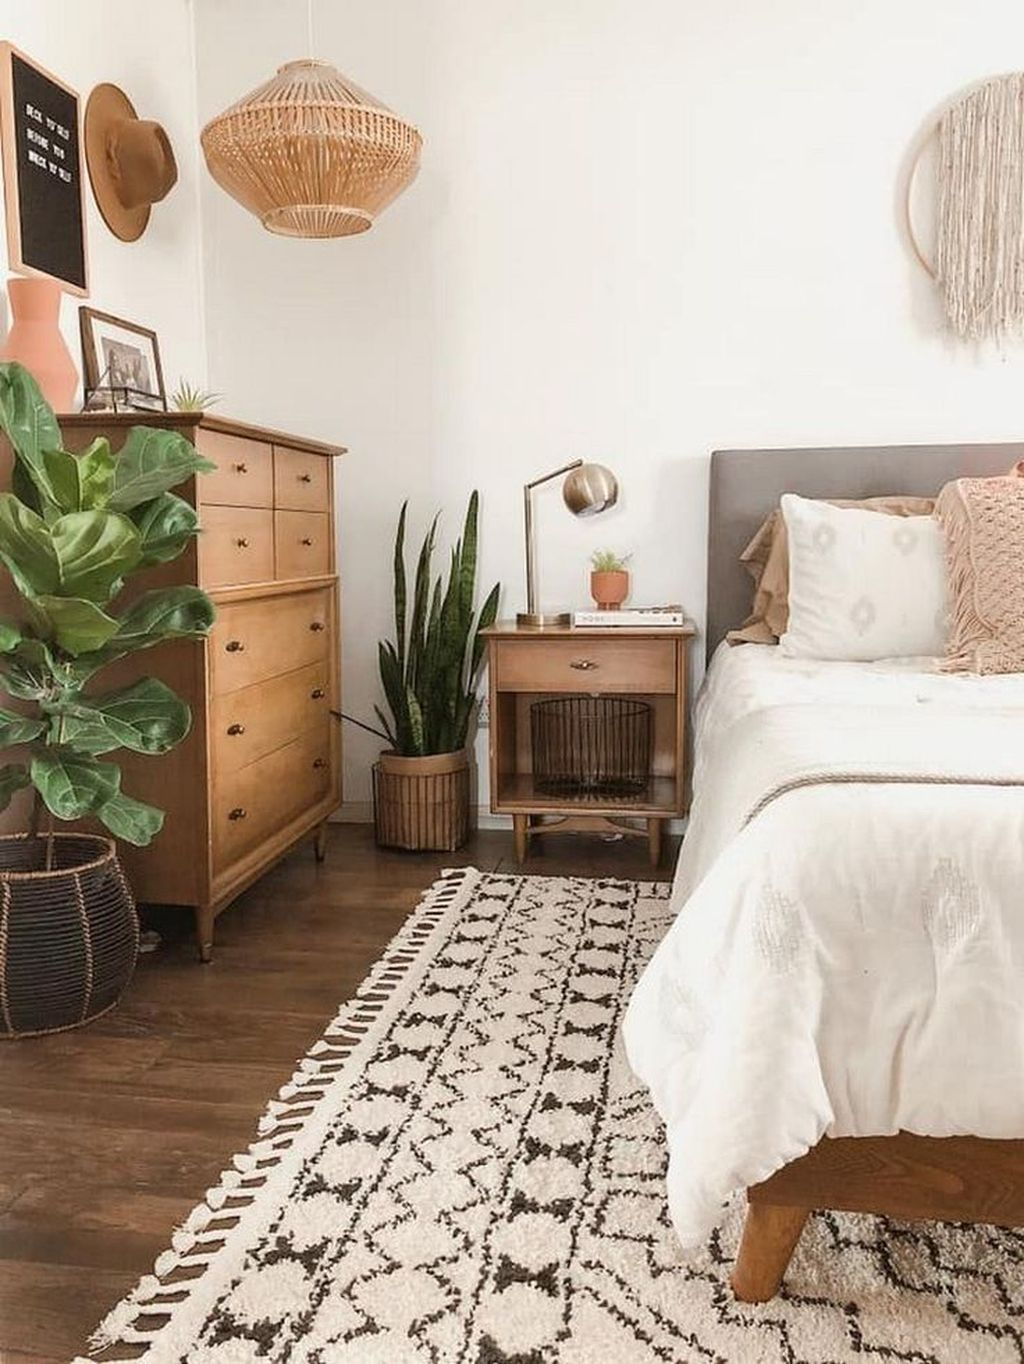 36 Stunning Apartment Bedroom Decor For Couples Look Romantic Bedroom Interior Home Decor Bedroom Home Decor